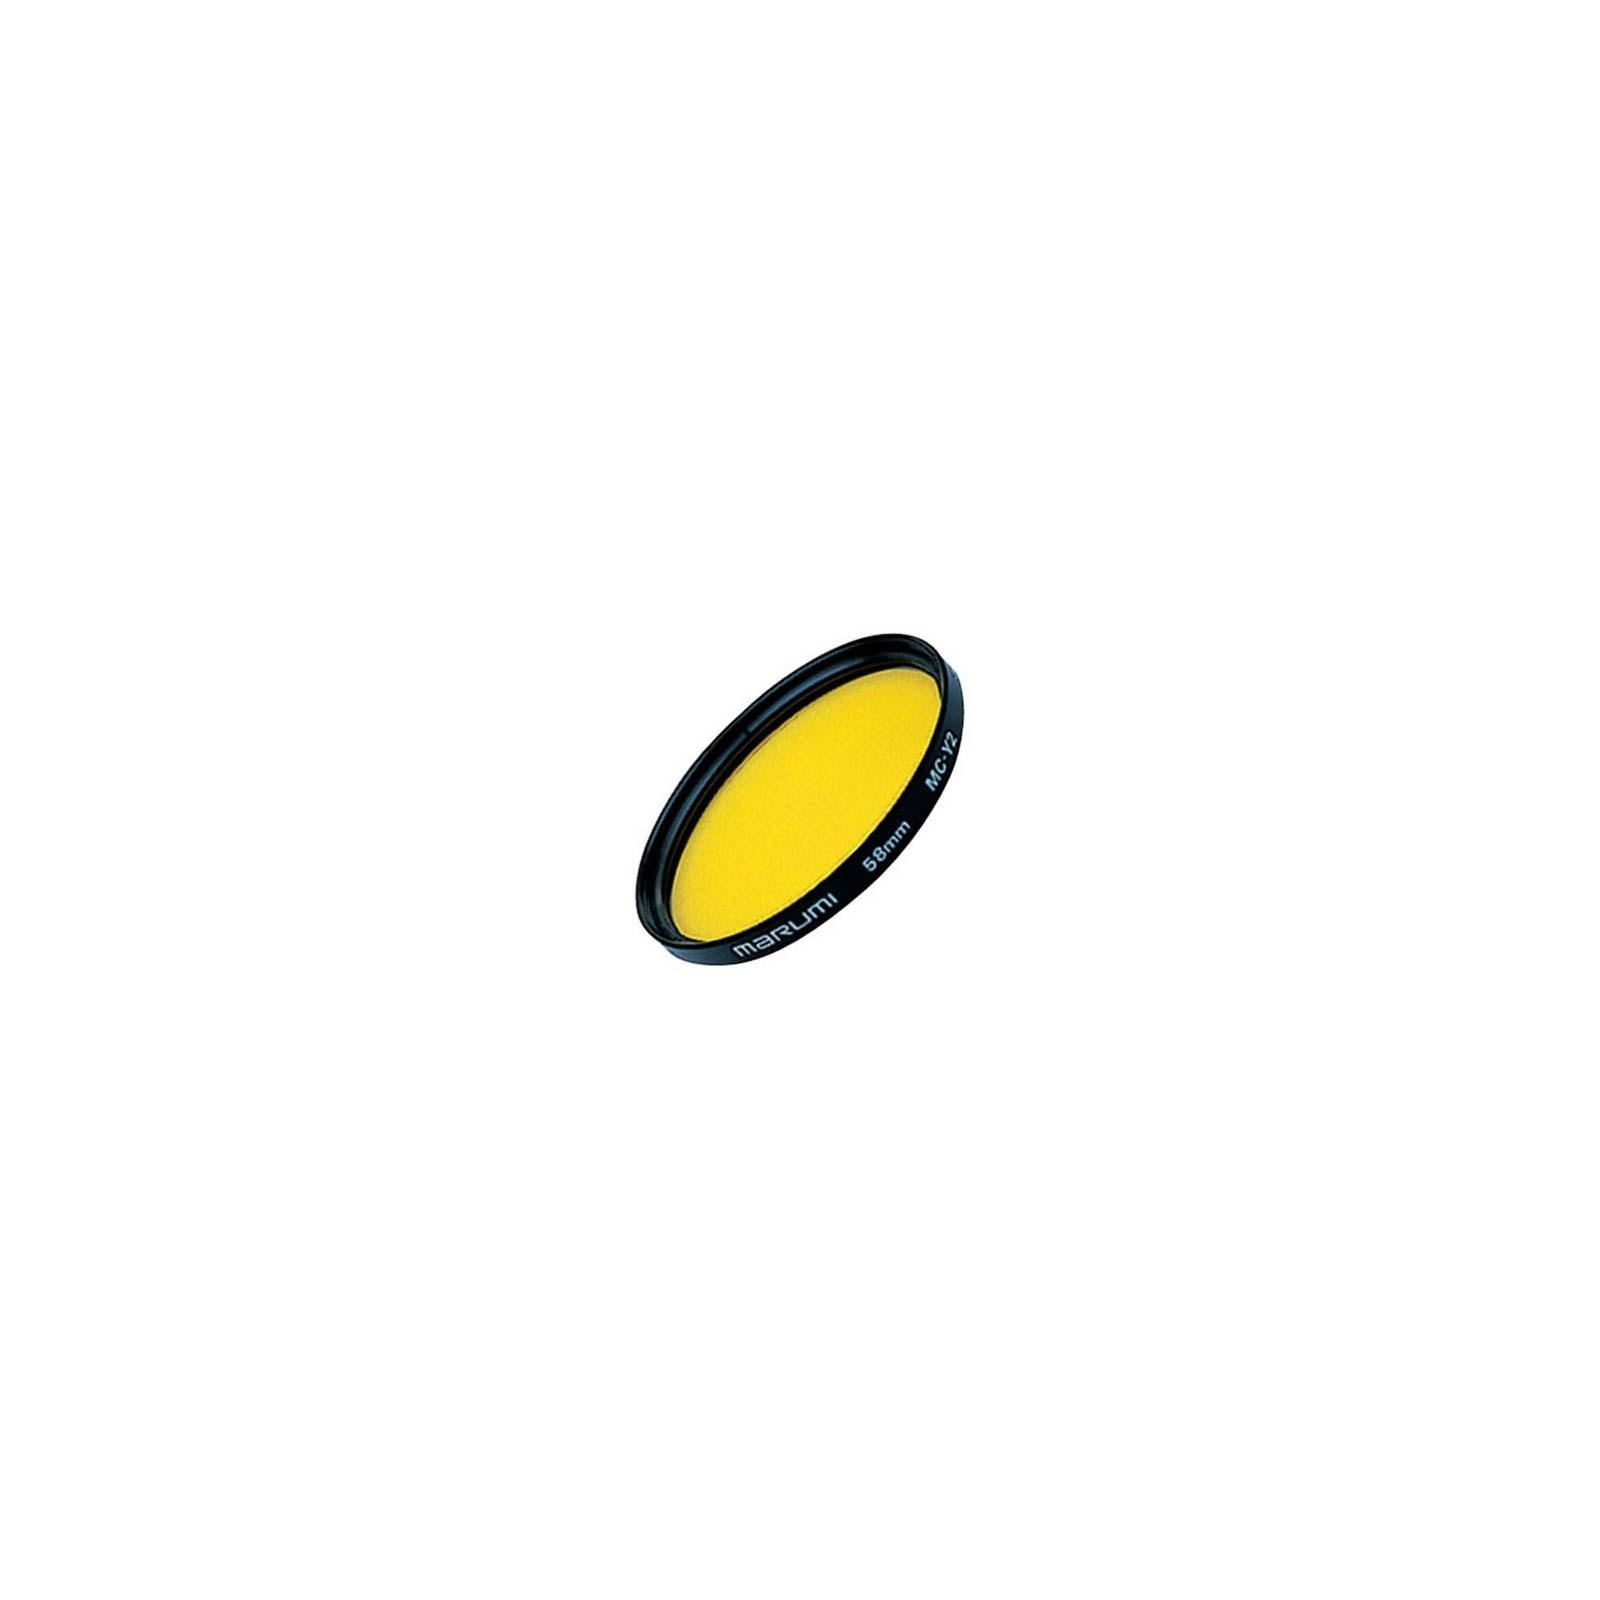 Светофильтр Marumi Y2 (yellow) 58mm